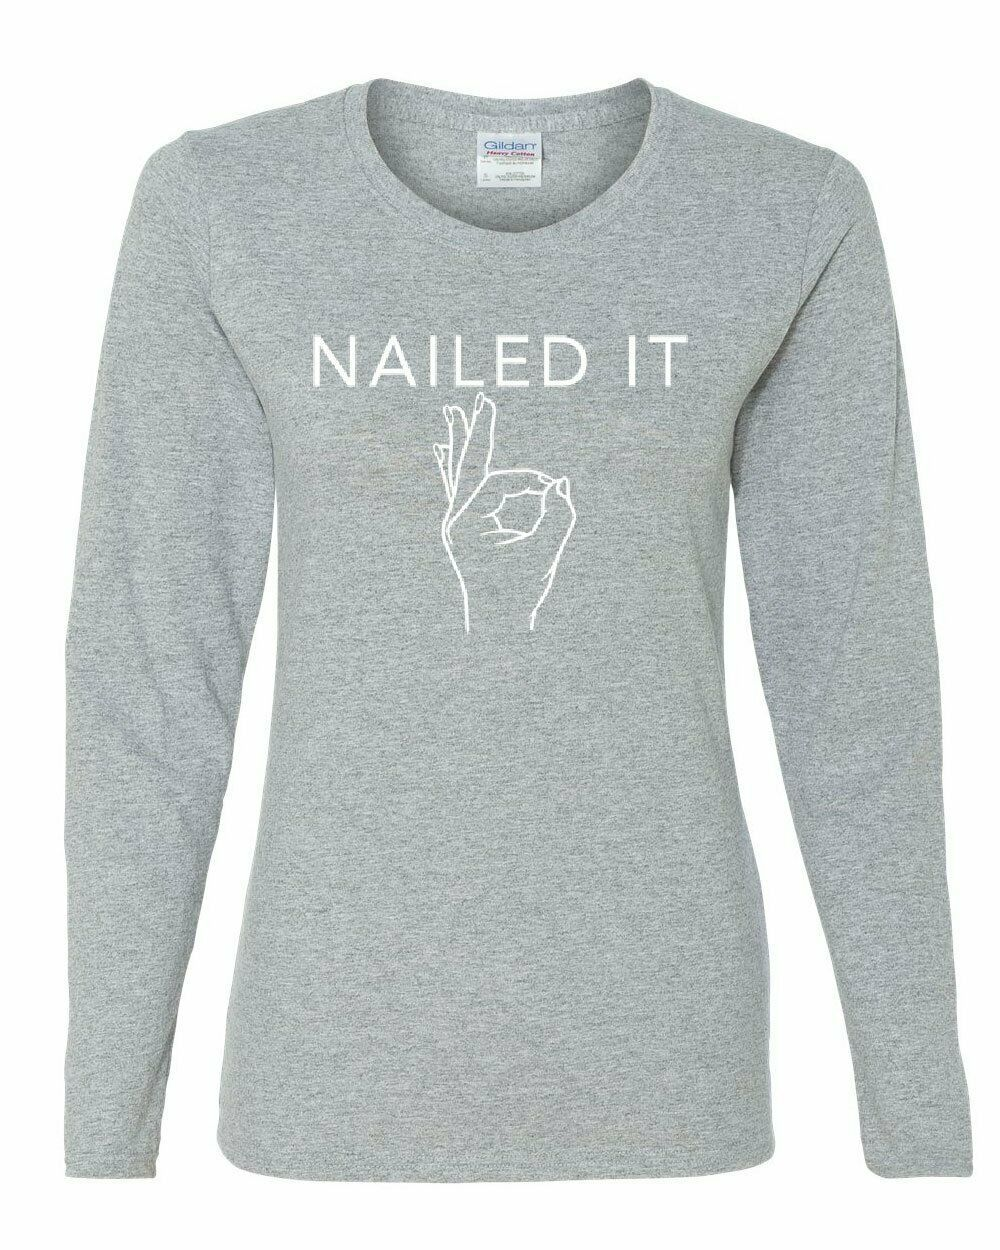 Nailed It Women's Long Sleeve Tee April Fools Pranks Funny